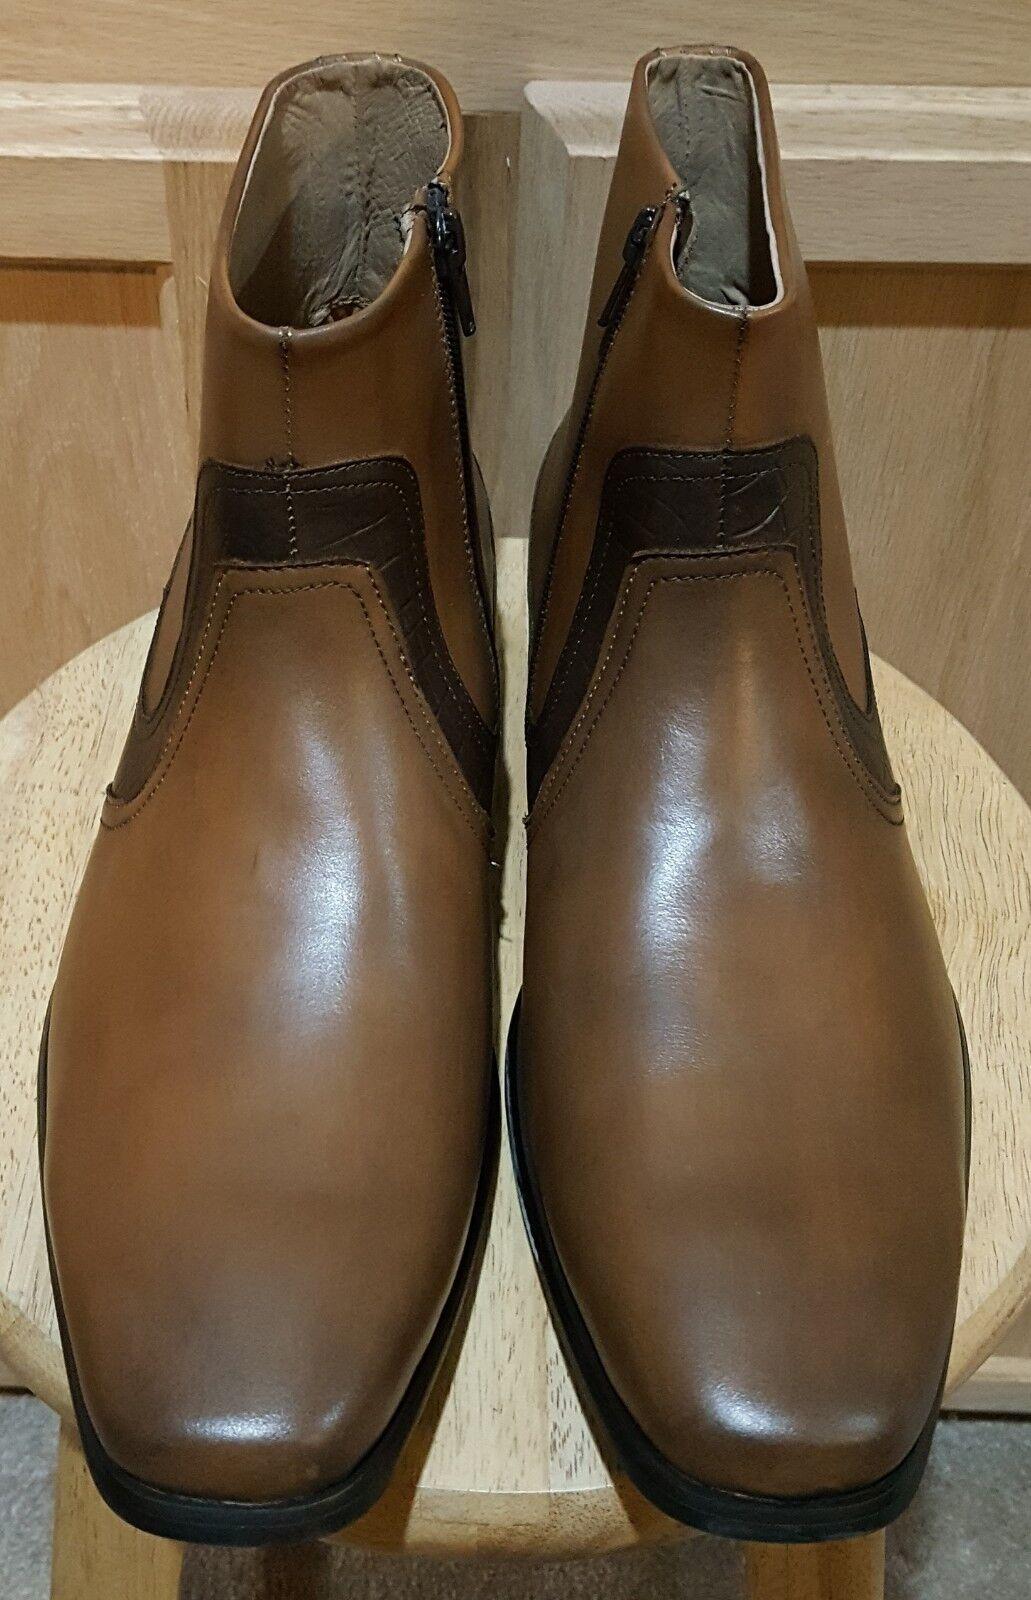 Cam Newton MADE Garner Tan Leather w w w Python Print Dress Stiefel - MSRP  160 1bcd34